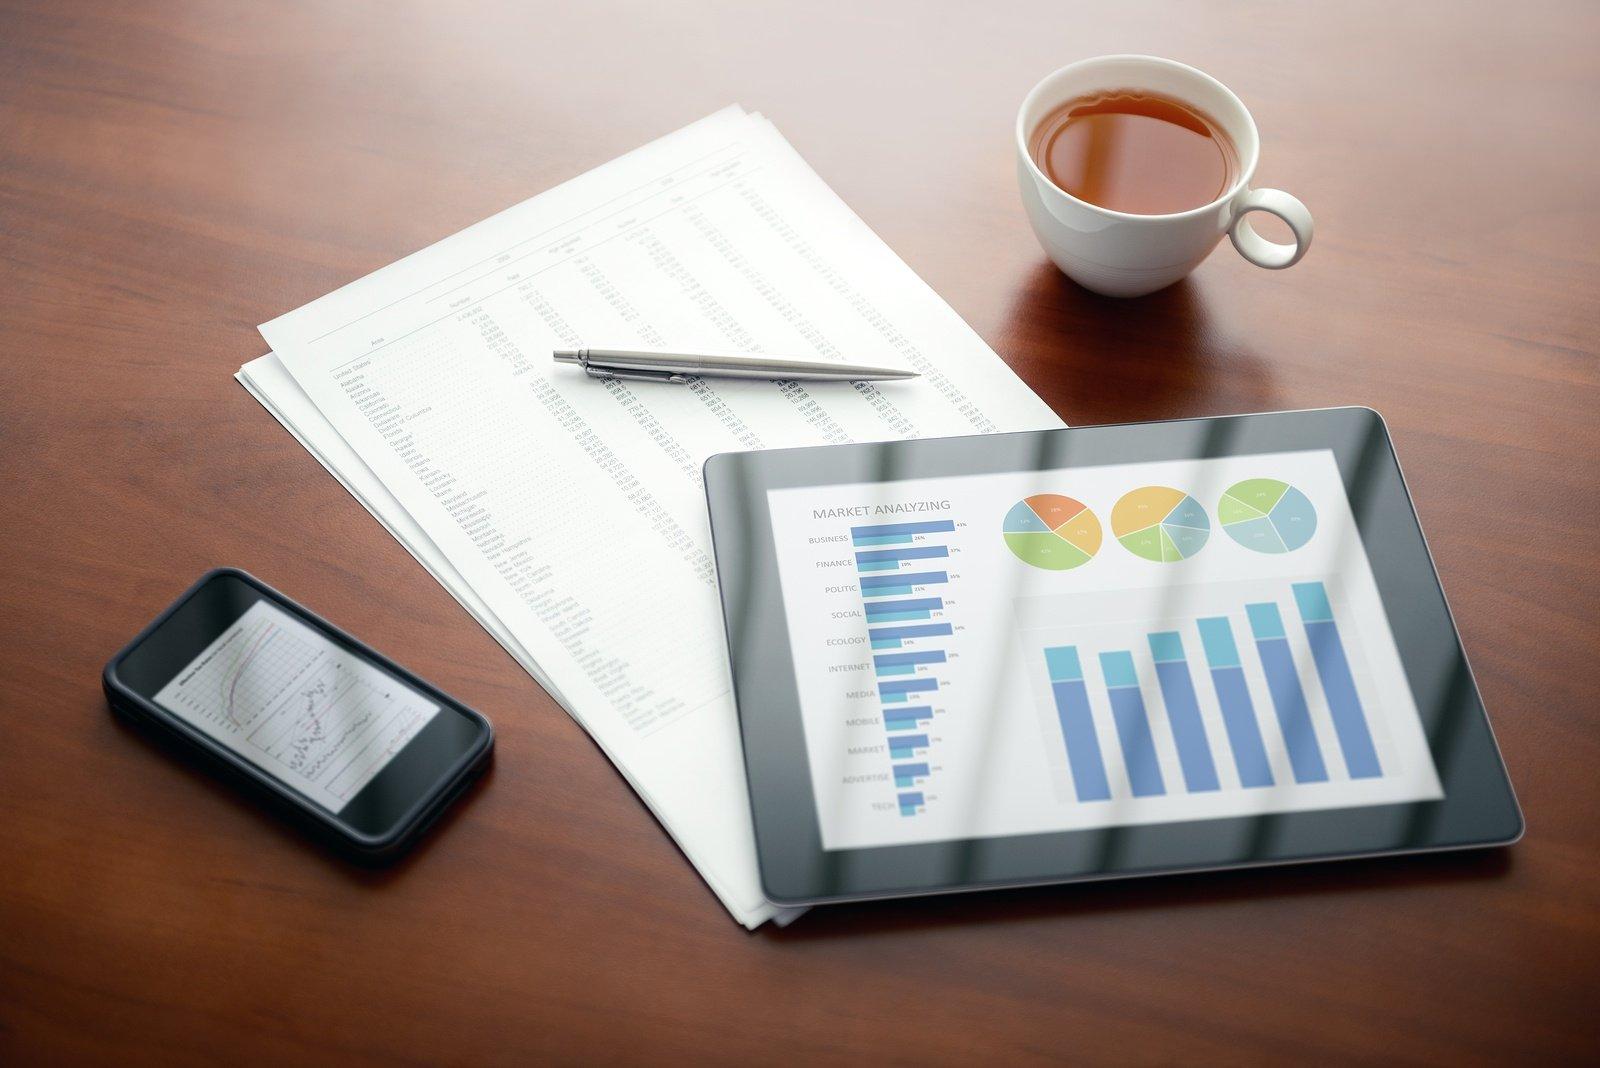 bigstock-Modern-Business-Workplace-33553085.jpg